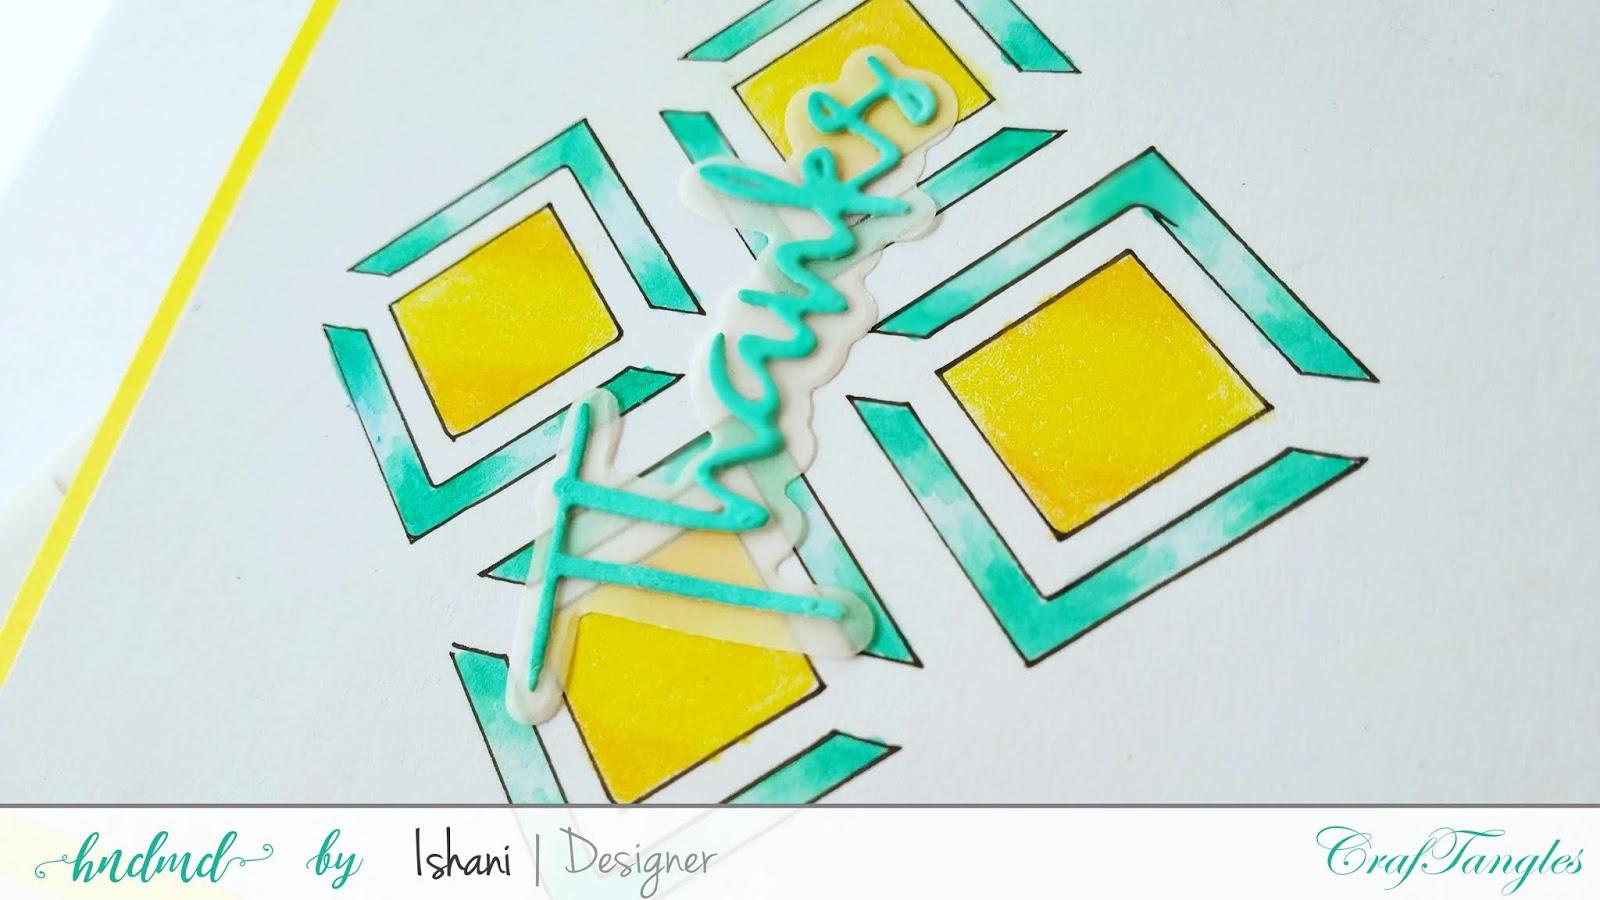 craftanglesstencils, chevron stencil, simply geometric stencil, neighbourhood stencil, waves stencil, craftangles glimmer paste, stretch your stencil, DT Ishani